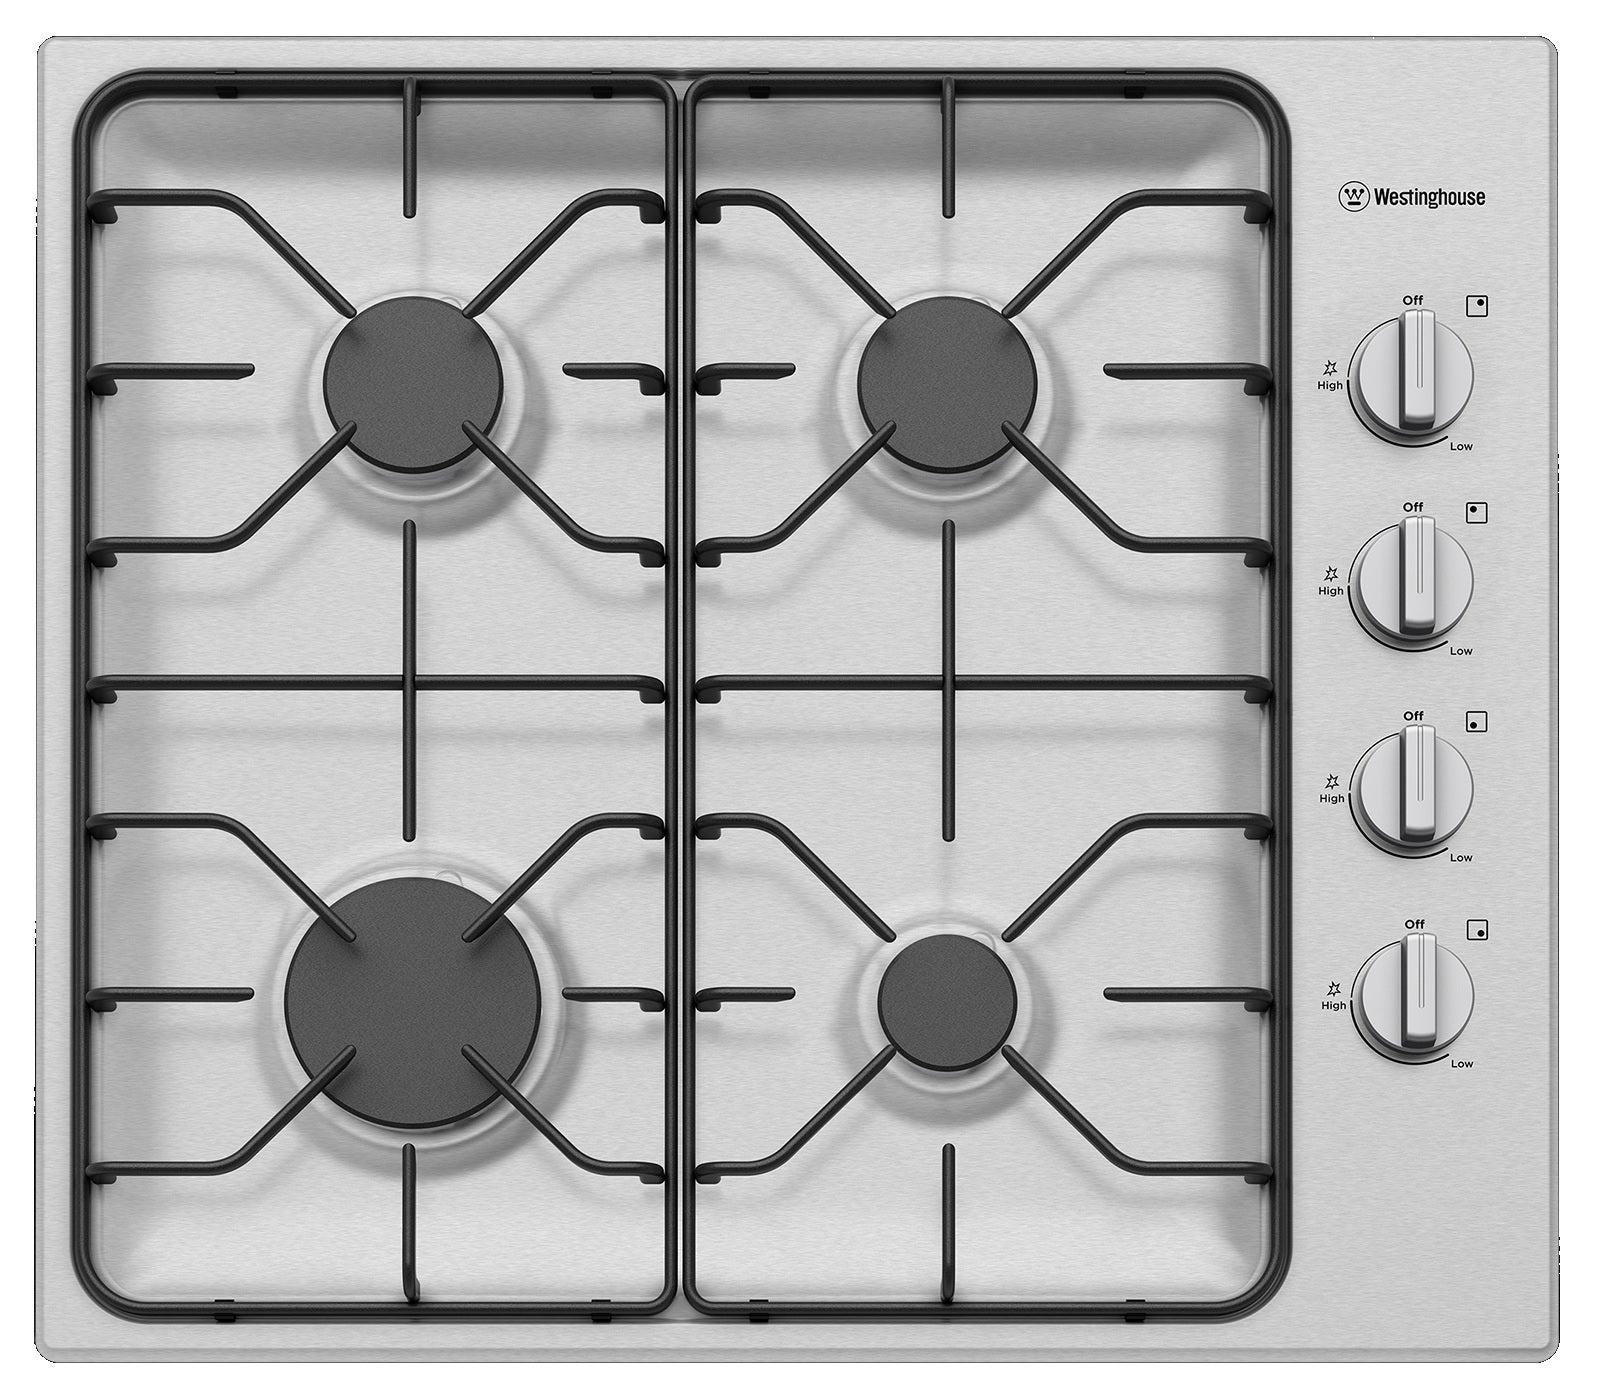 Westinghouse WHG640SC Kitchen Cooktop